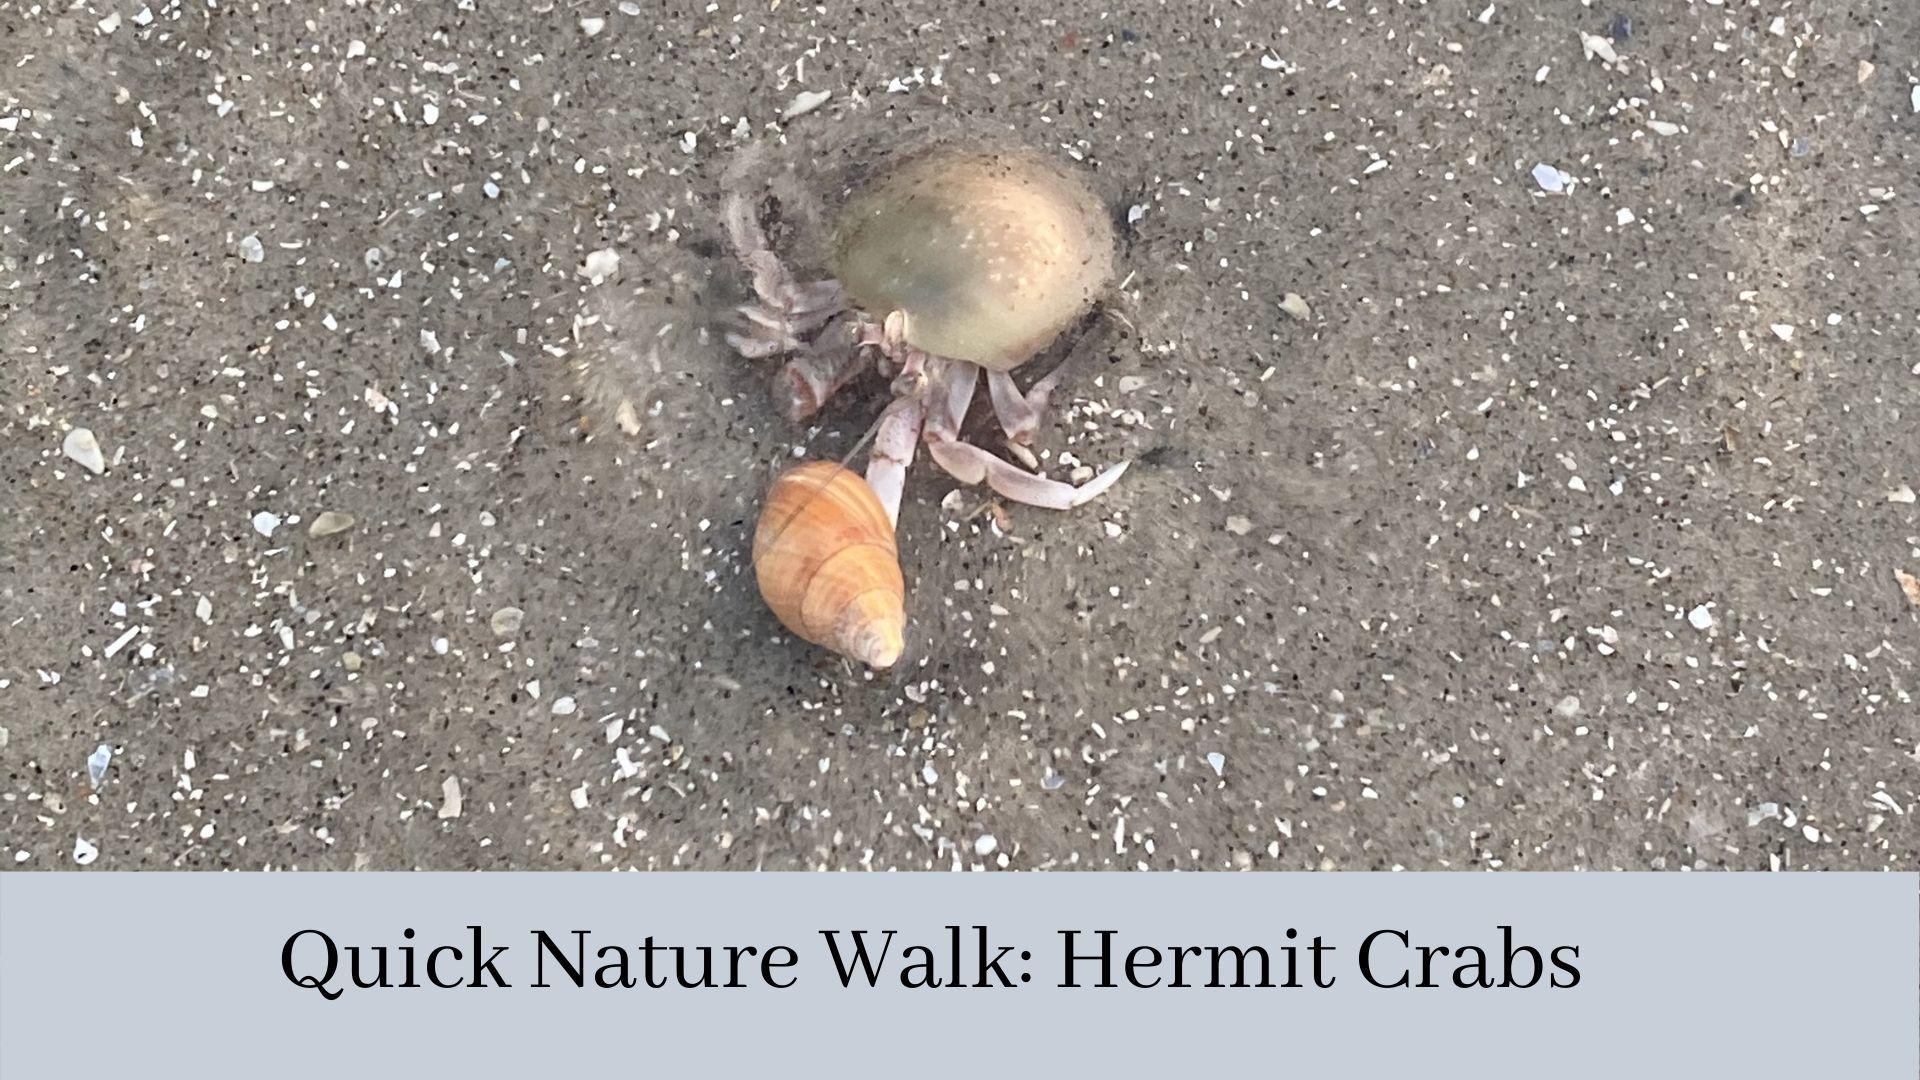 Some Quick Nature Videos